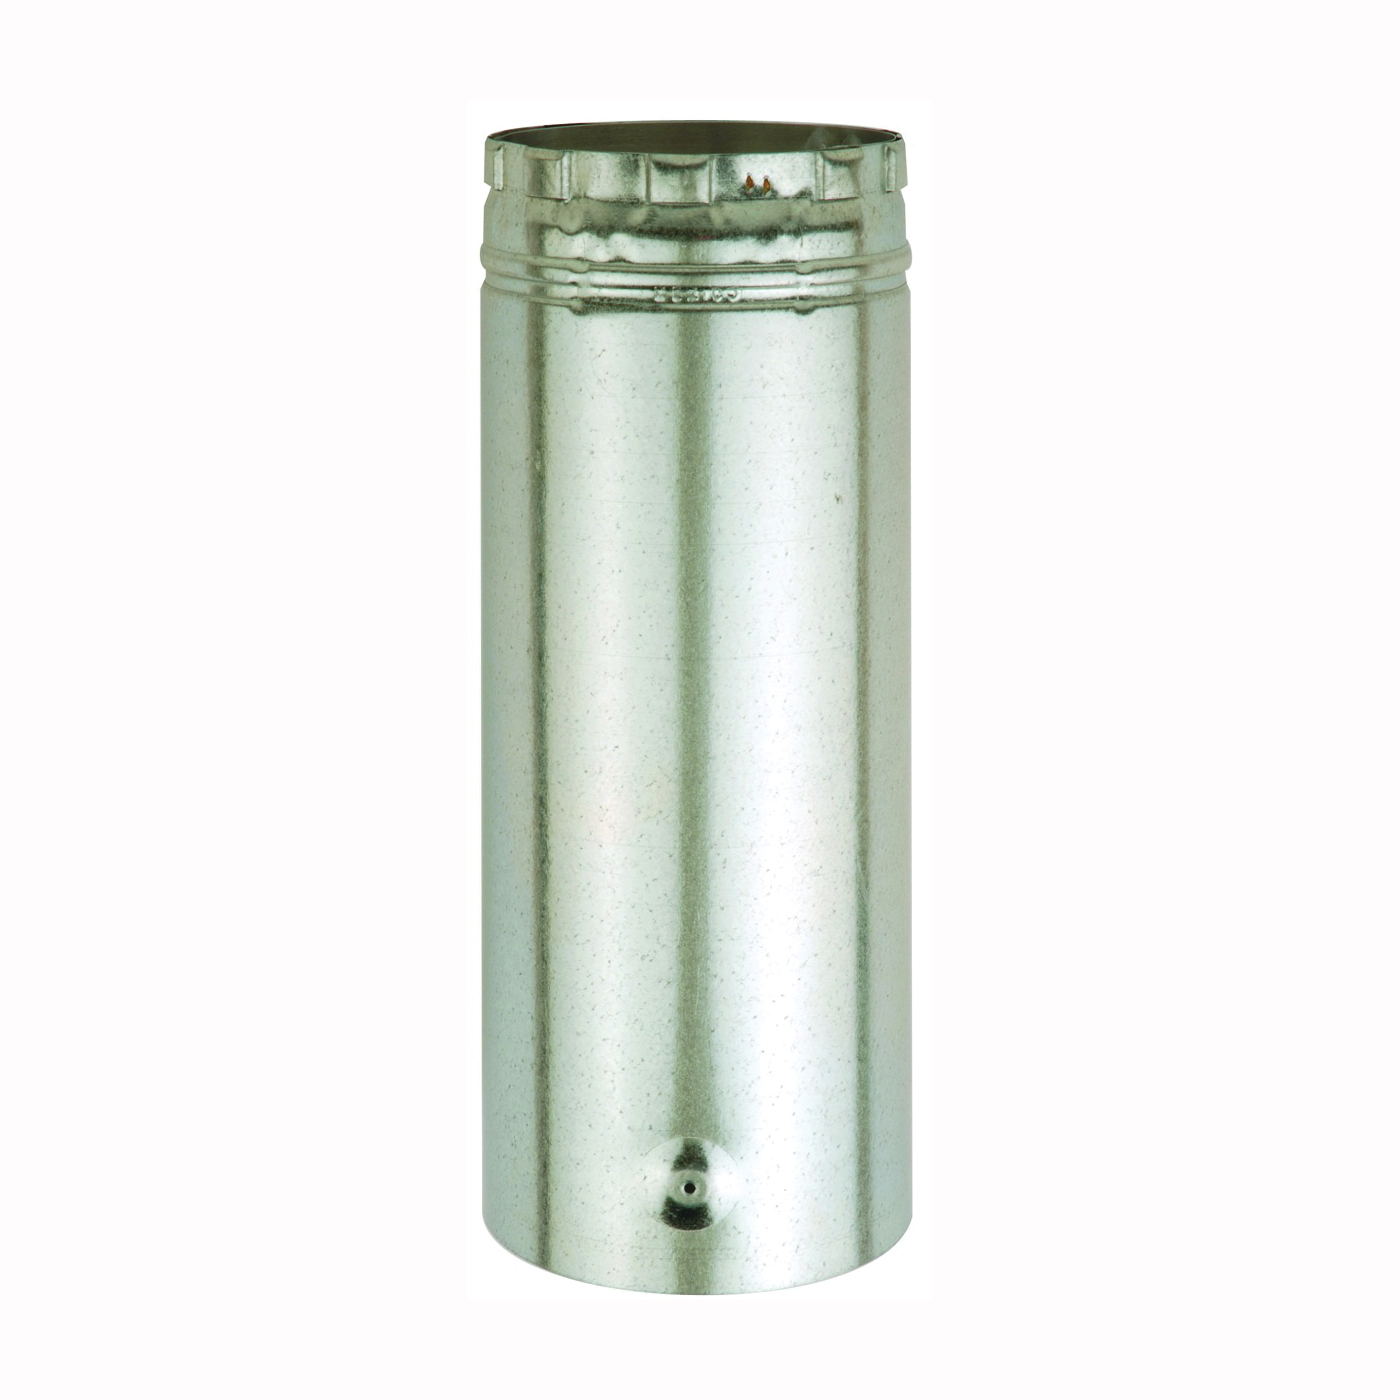 Picture of AmeriVent 4E12A Type B Gas Vent Pipe, 4 in OD, 12 in L, Galvanized Steel